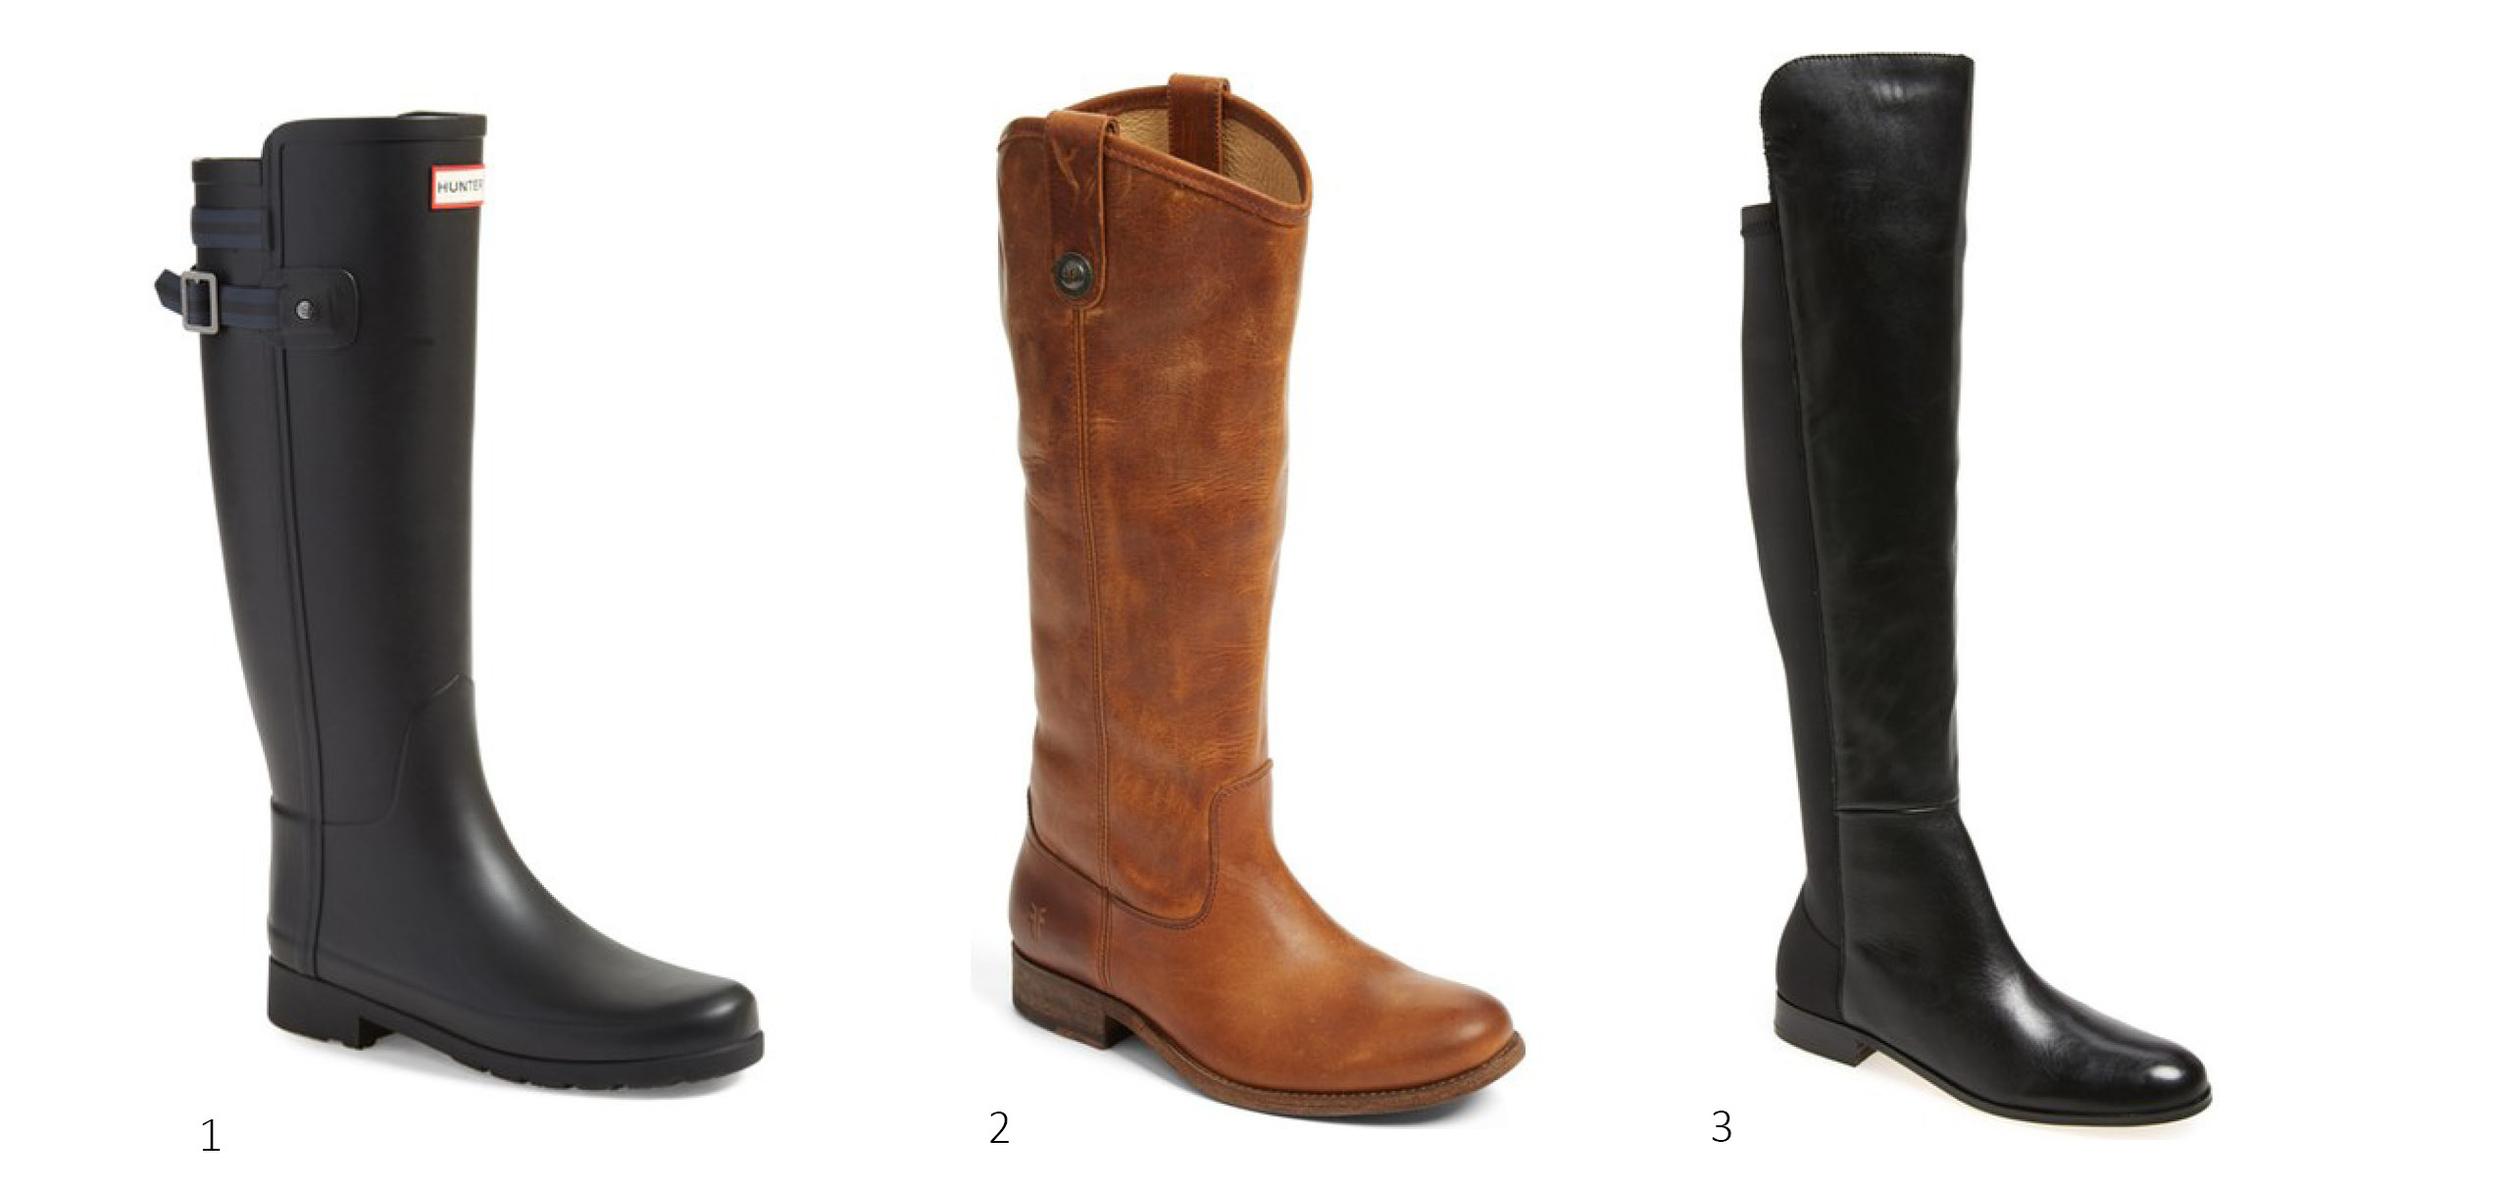 1. Hunter 'Original Refined' Rain Boot $129.90 ; 2.  Frye Melissa Button Riding Boot $246 ; 3.  Corso Como Laura Over the Knee boot $150